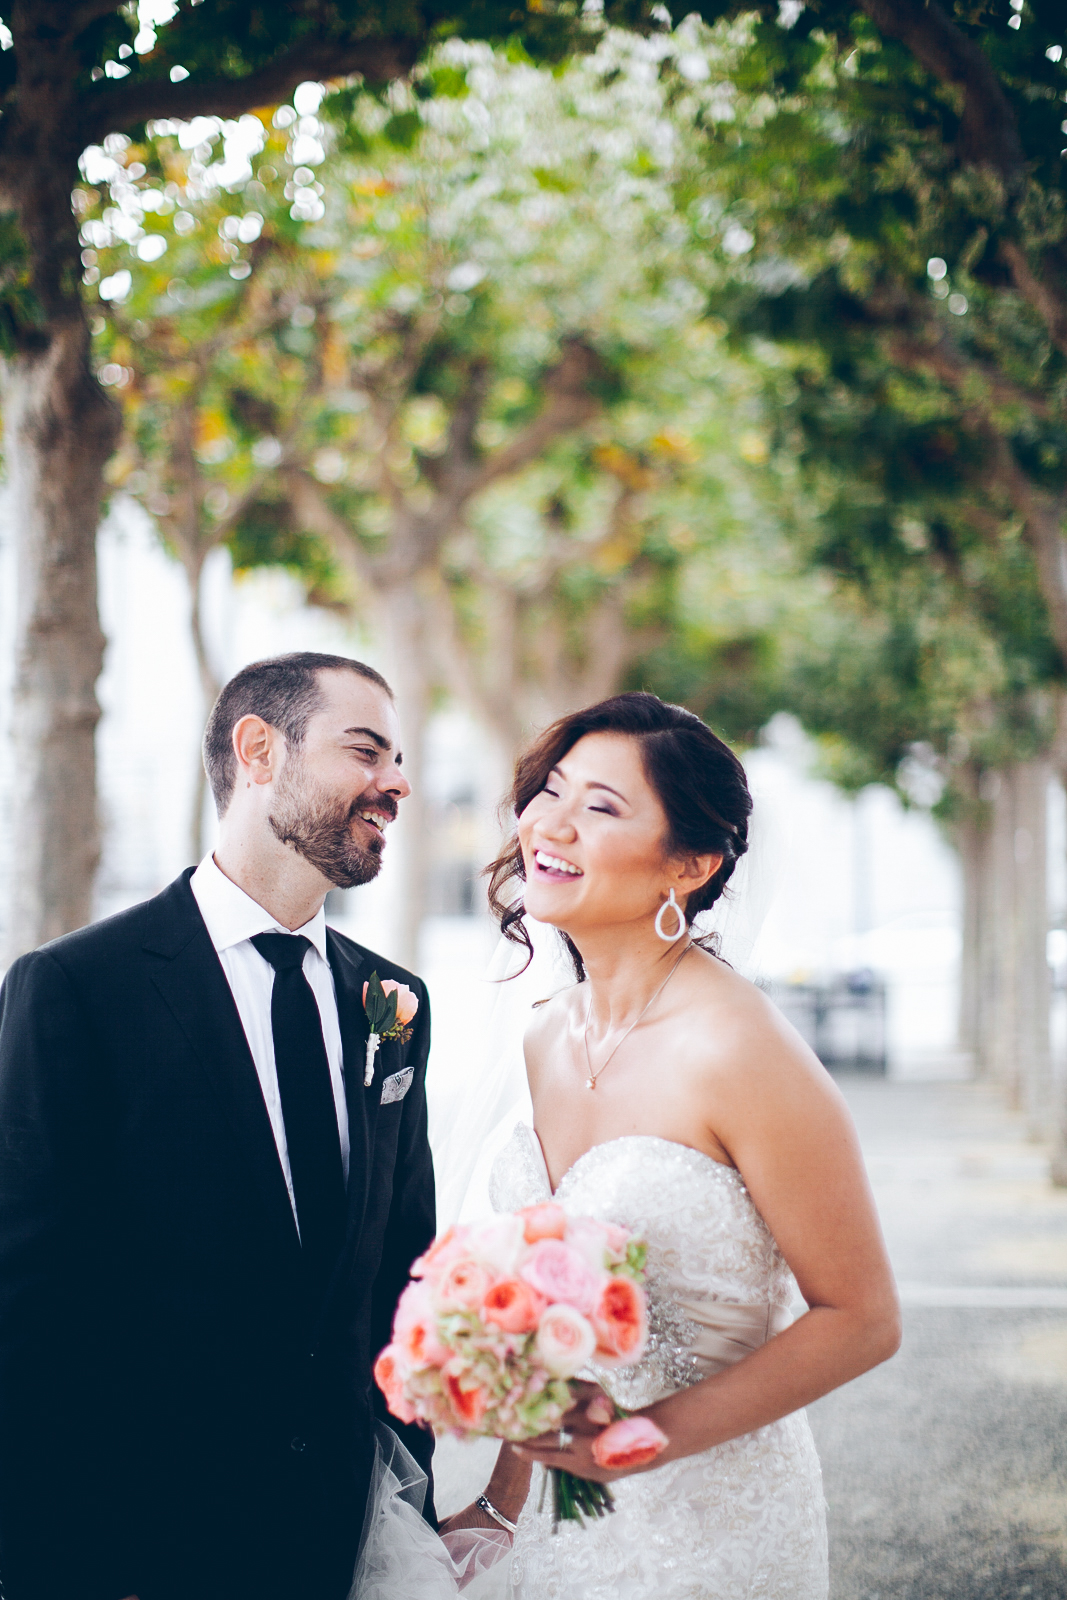 San_francisco_city_hall_wedding_photography_meegan_travis_ebony_siovhan_bokeh_photography_61.jpg